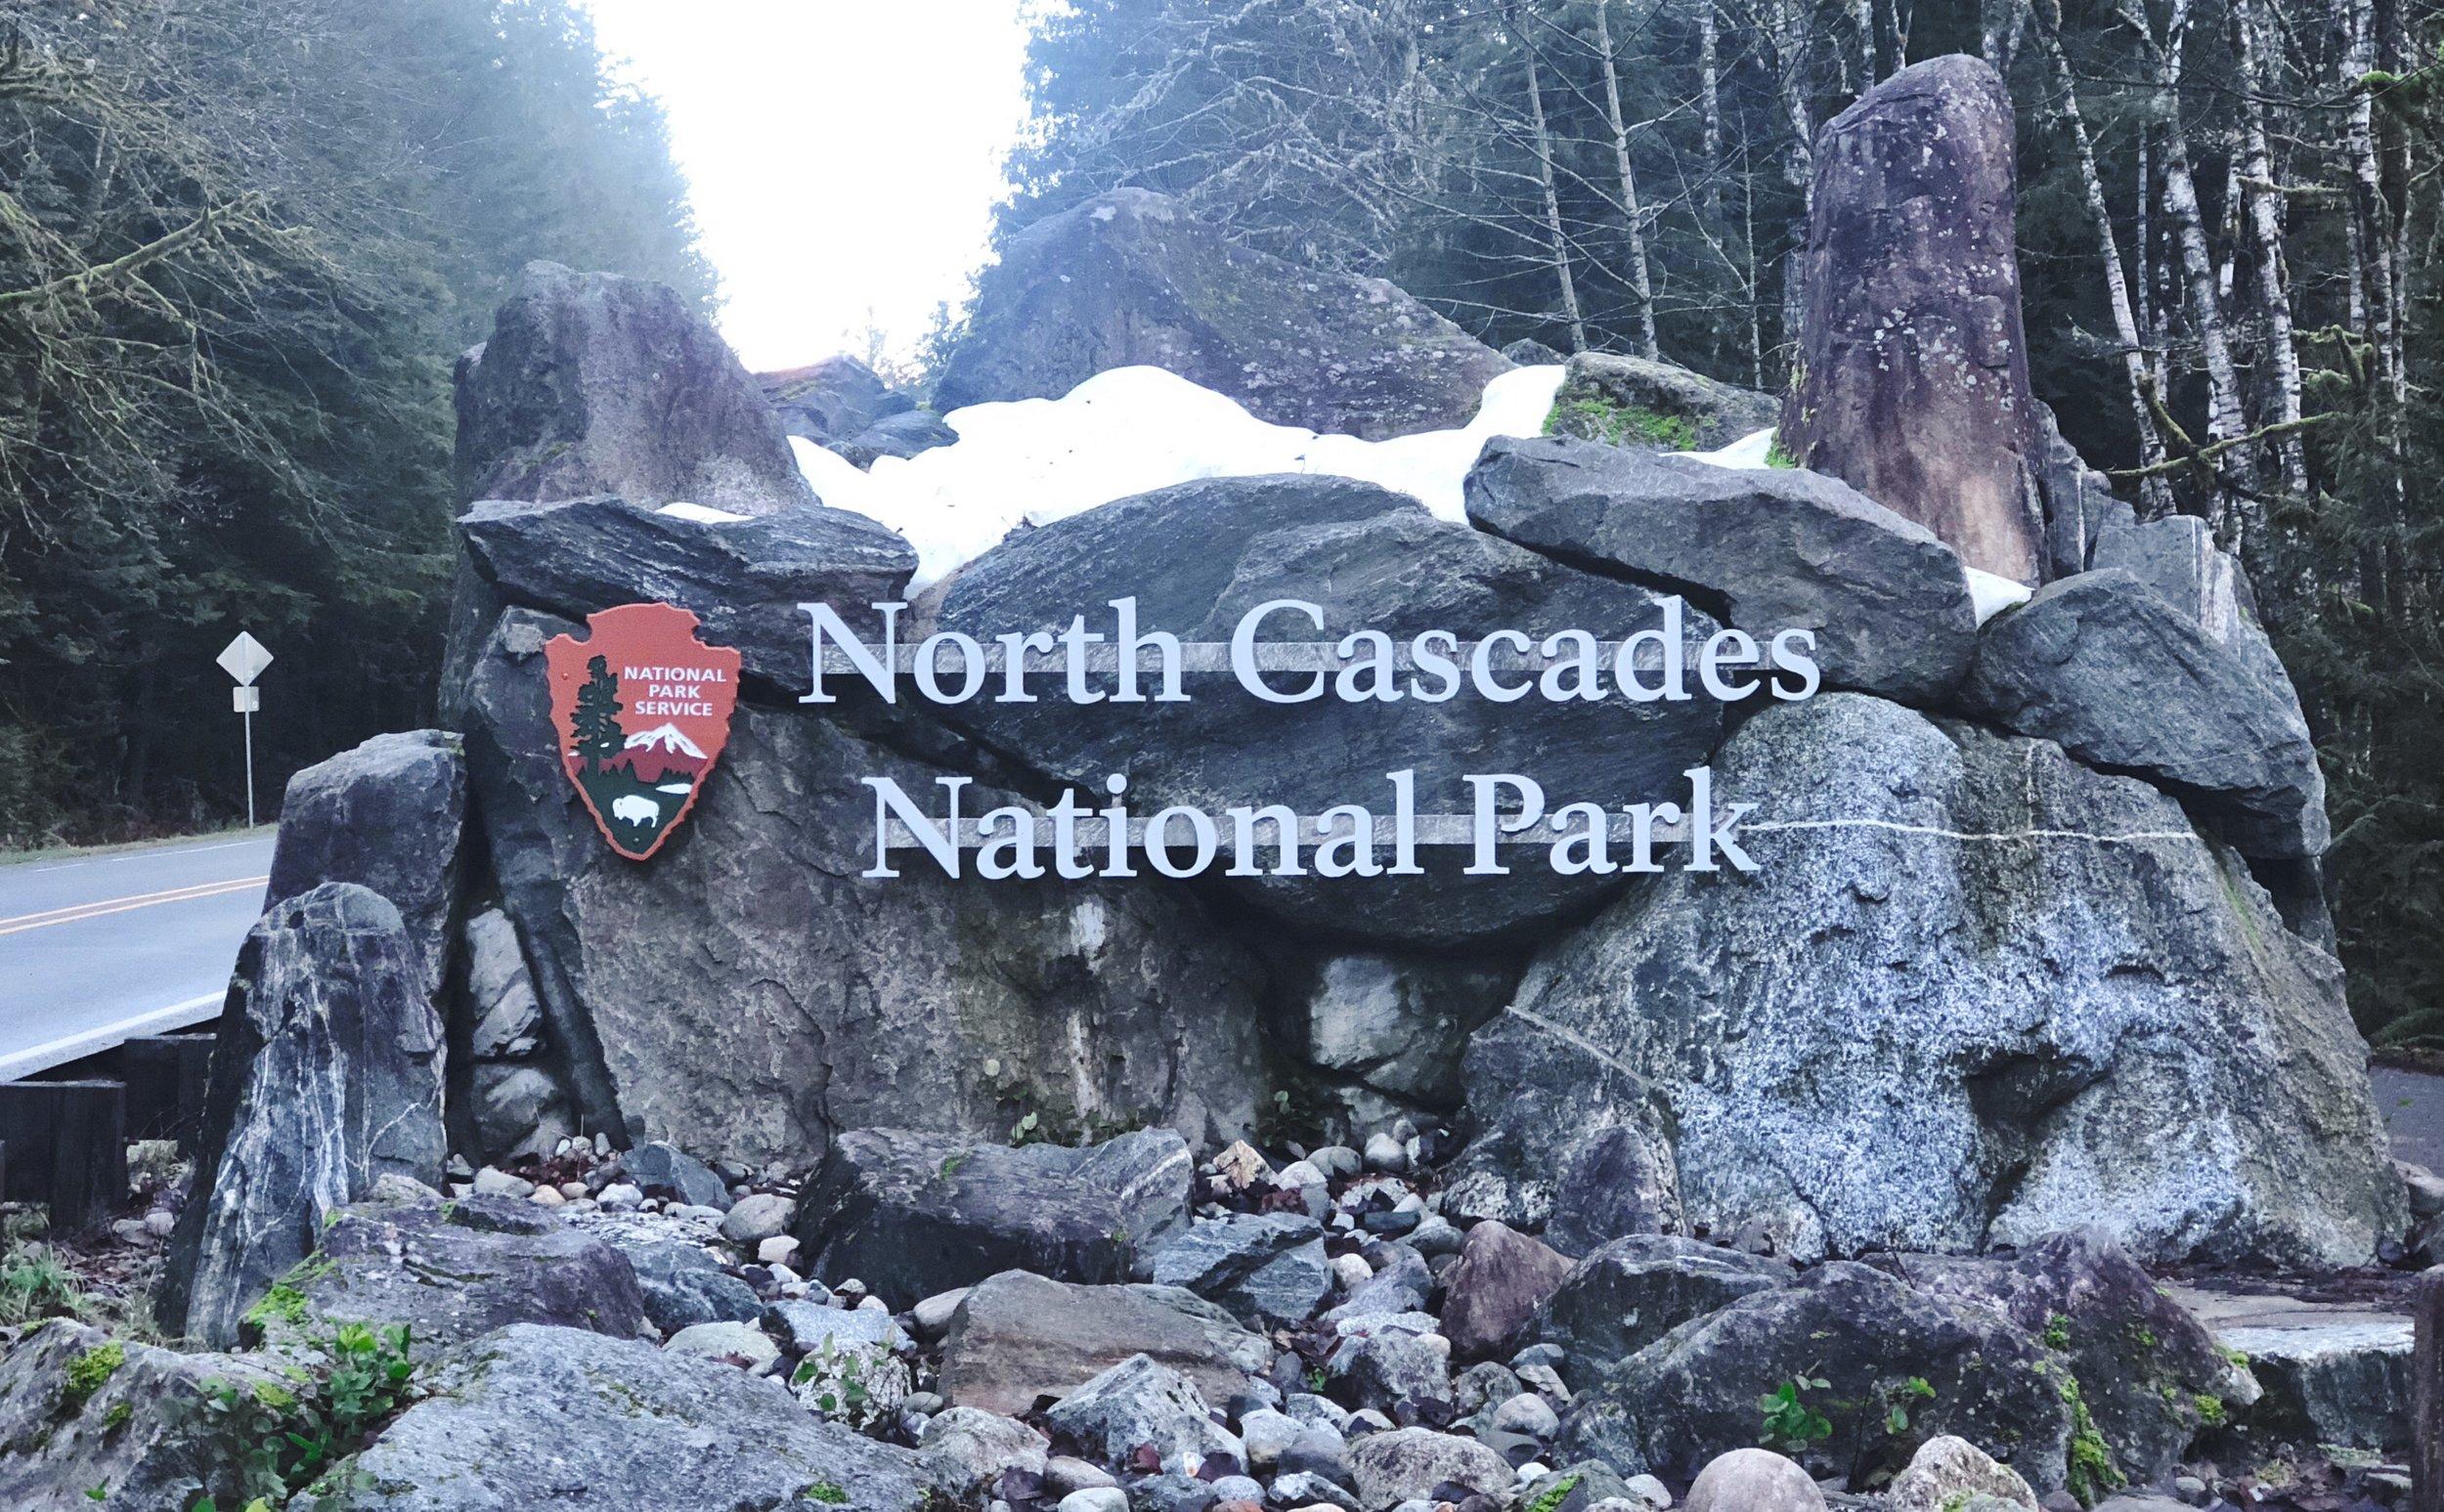 North Cascades Sign